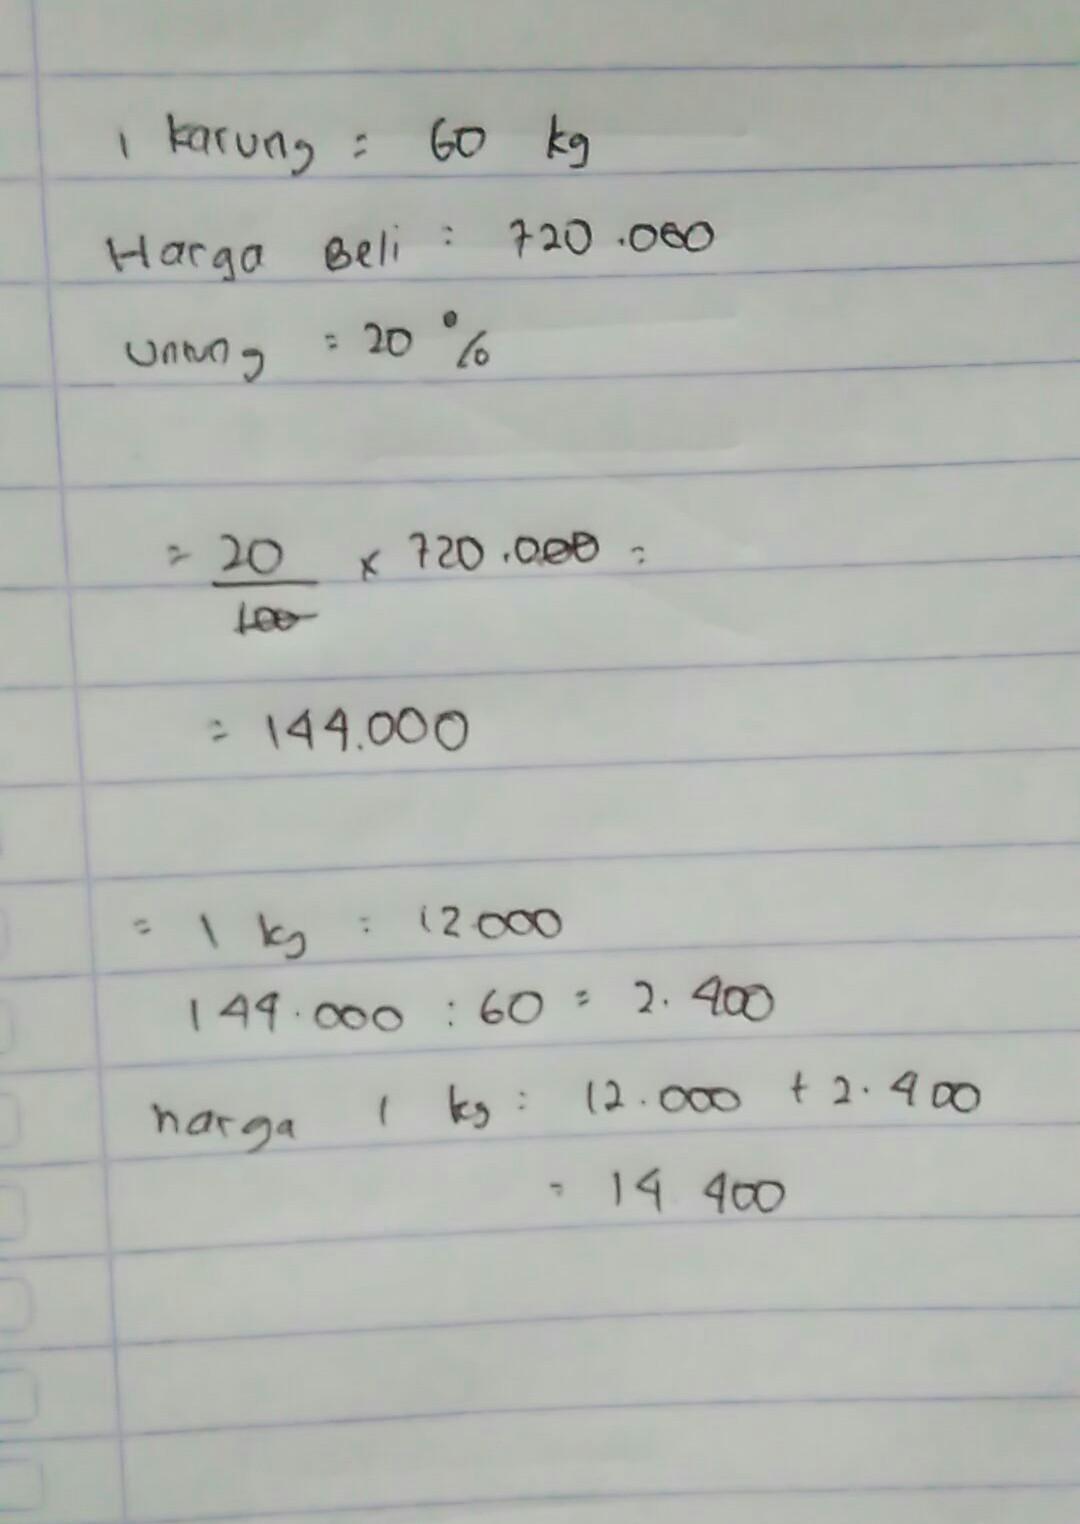 Seorang Pedagang Membeli Satu Karung Beras Berisi 60 Kg Seharga Rp720 000 00 Jika Pedagang Tsb Brainly Co Id